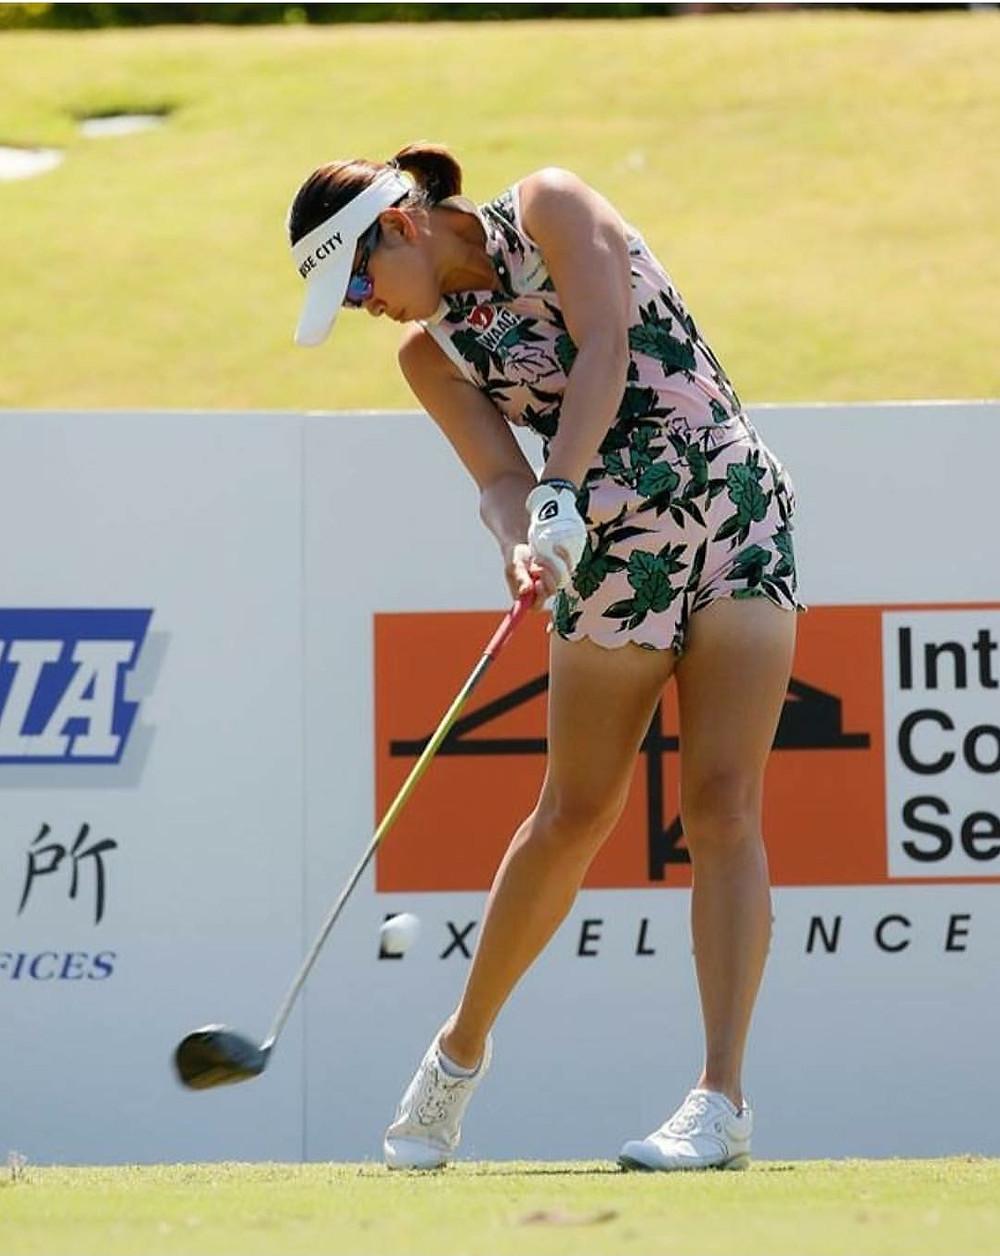 tee shot, driver, golf ball, Korea LPGA, CLPGA, TLPGA,